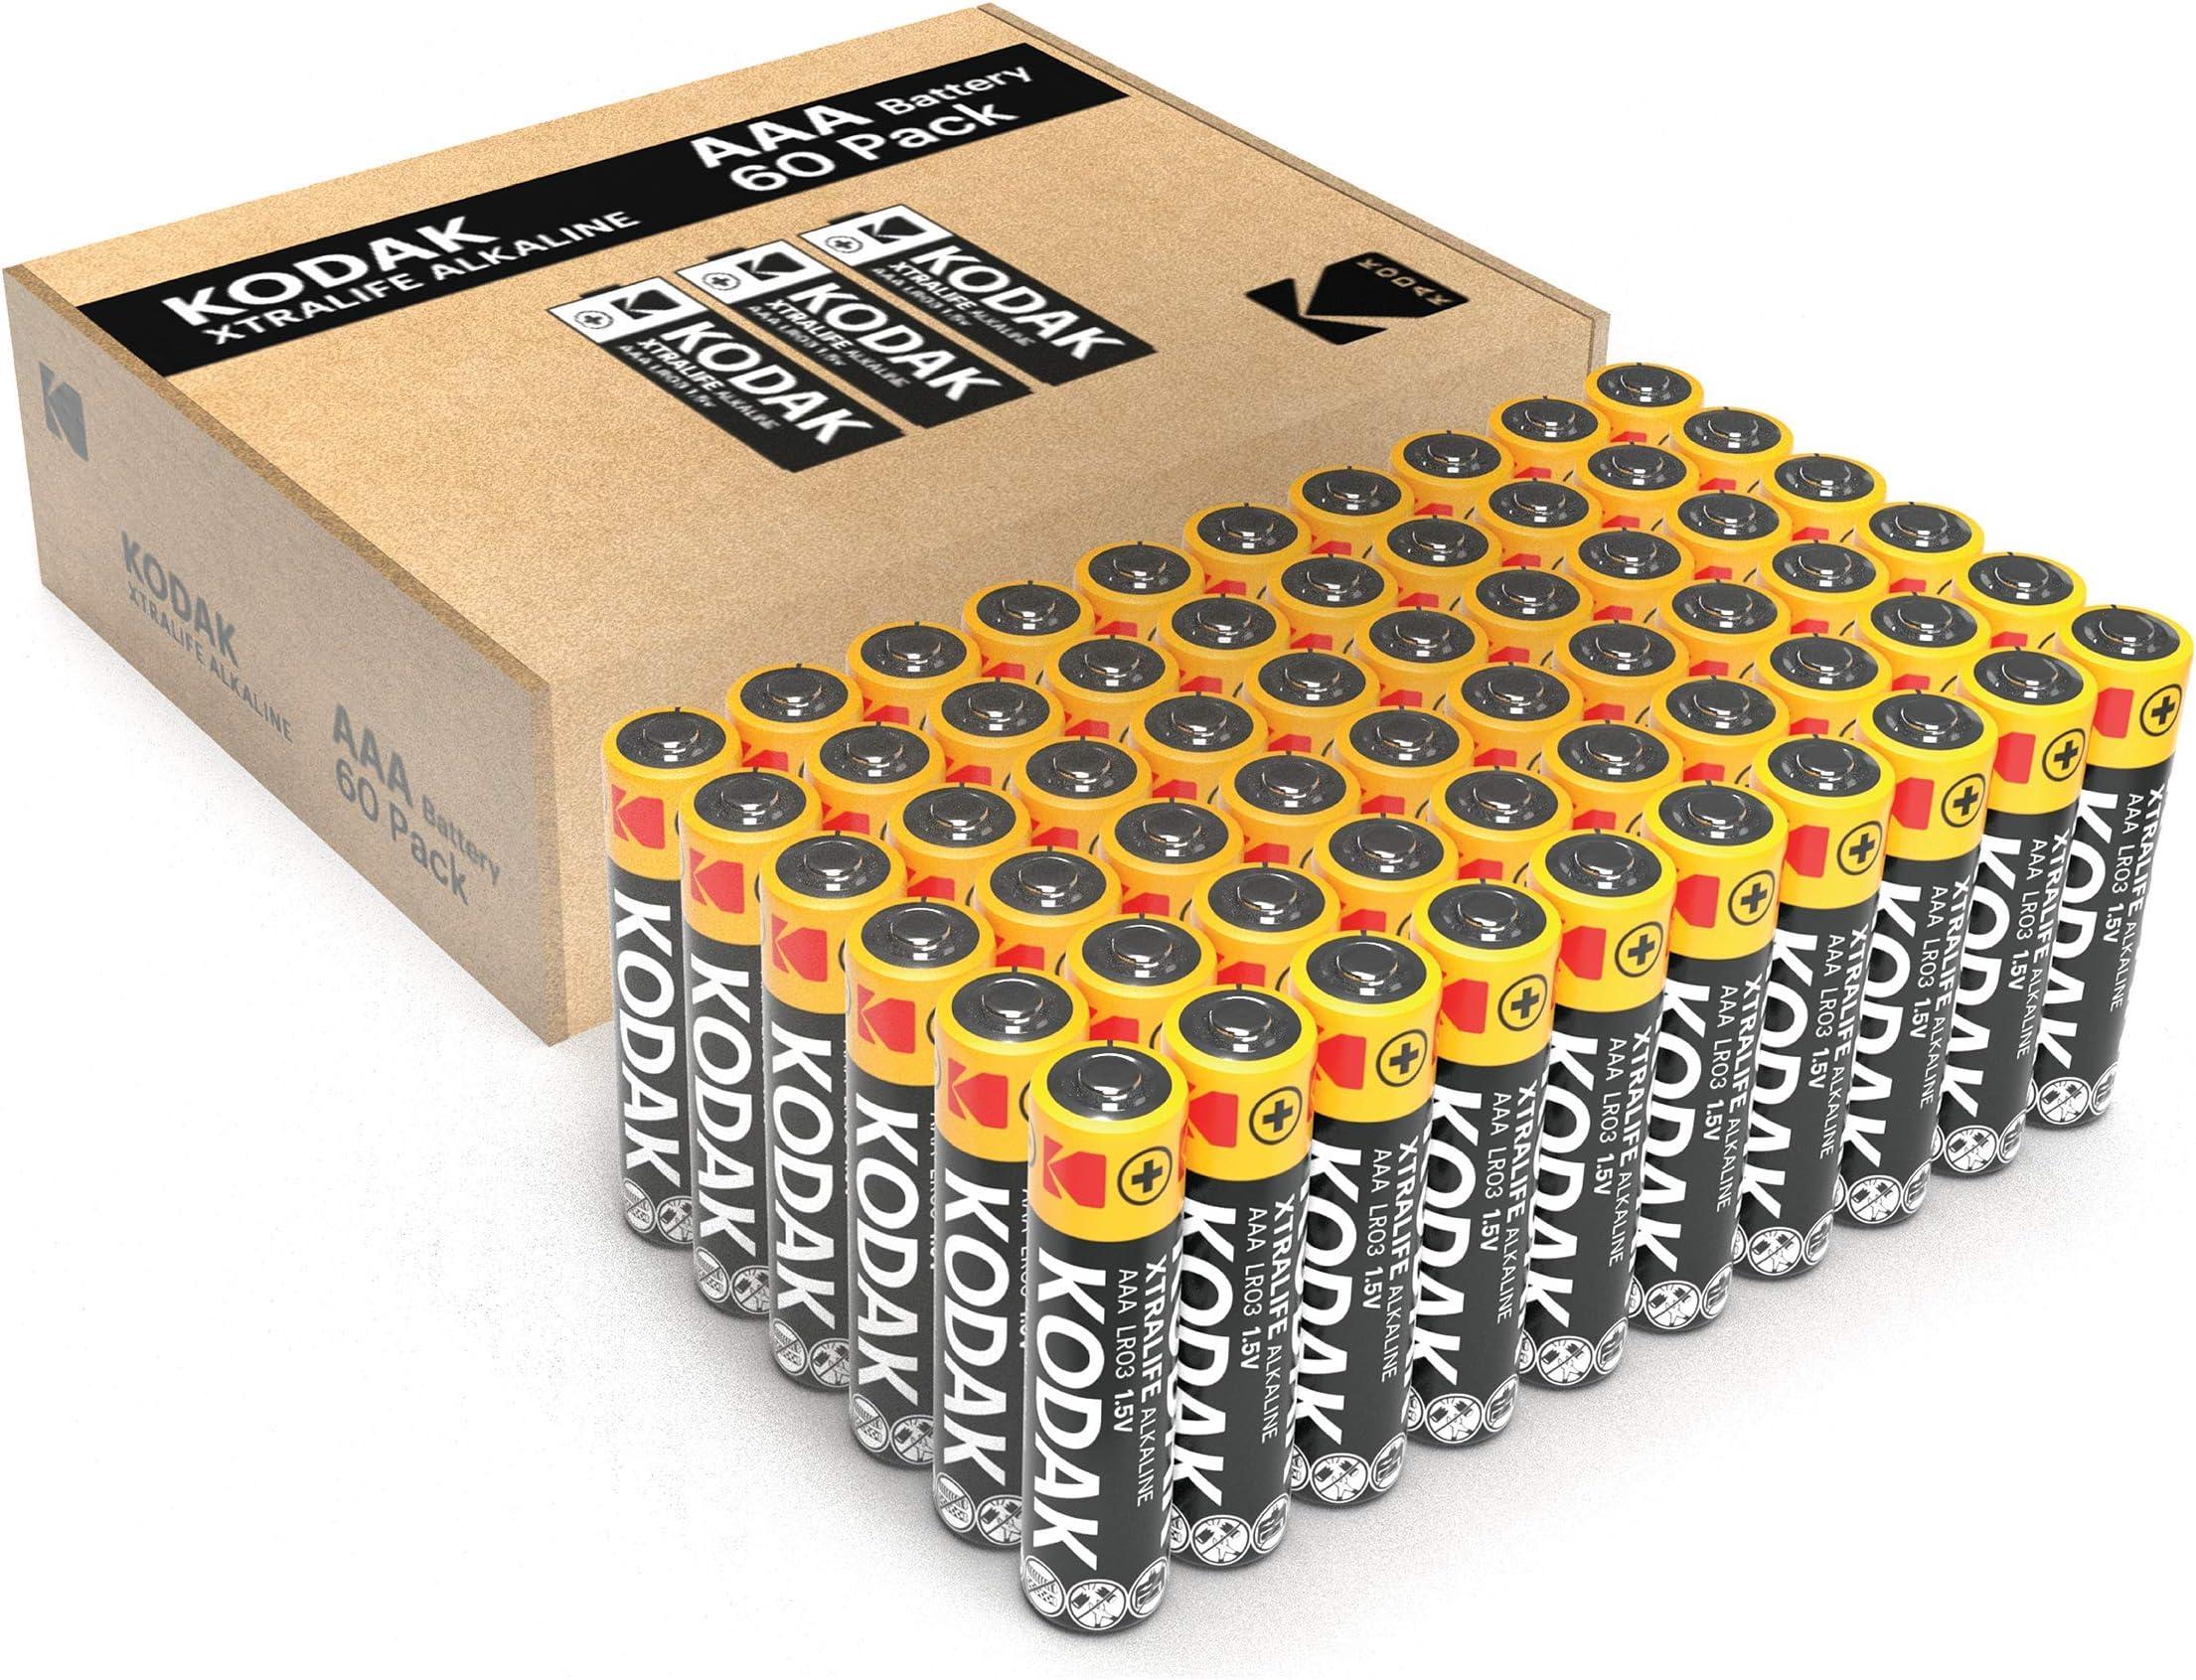 Amazon Com Kodak Aaa Batteries Long Lasting Performance Alkaline Batteries 1 5v 10 Year Shelf Life Bulk Pack 60 Aaa Electronics